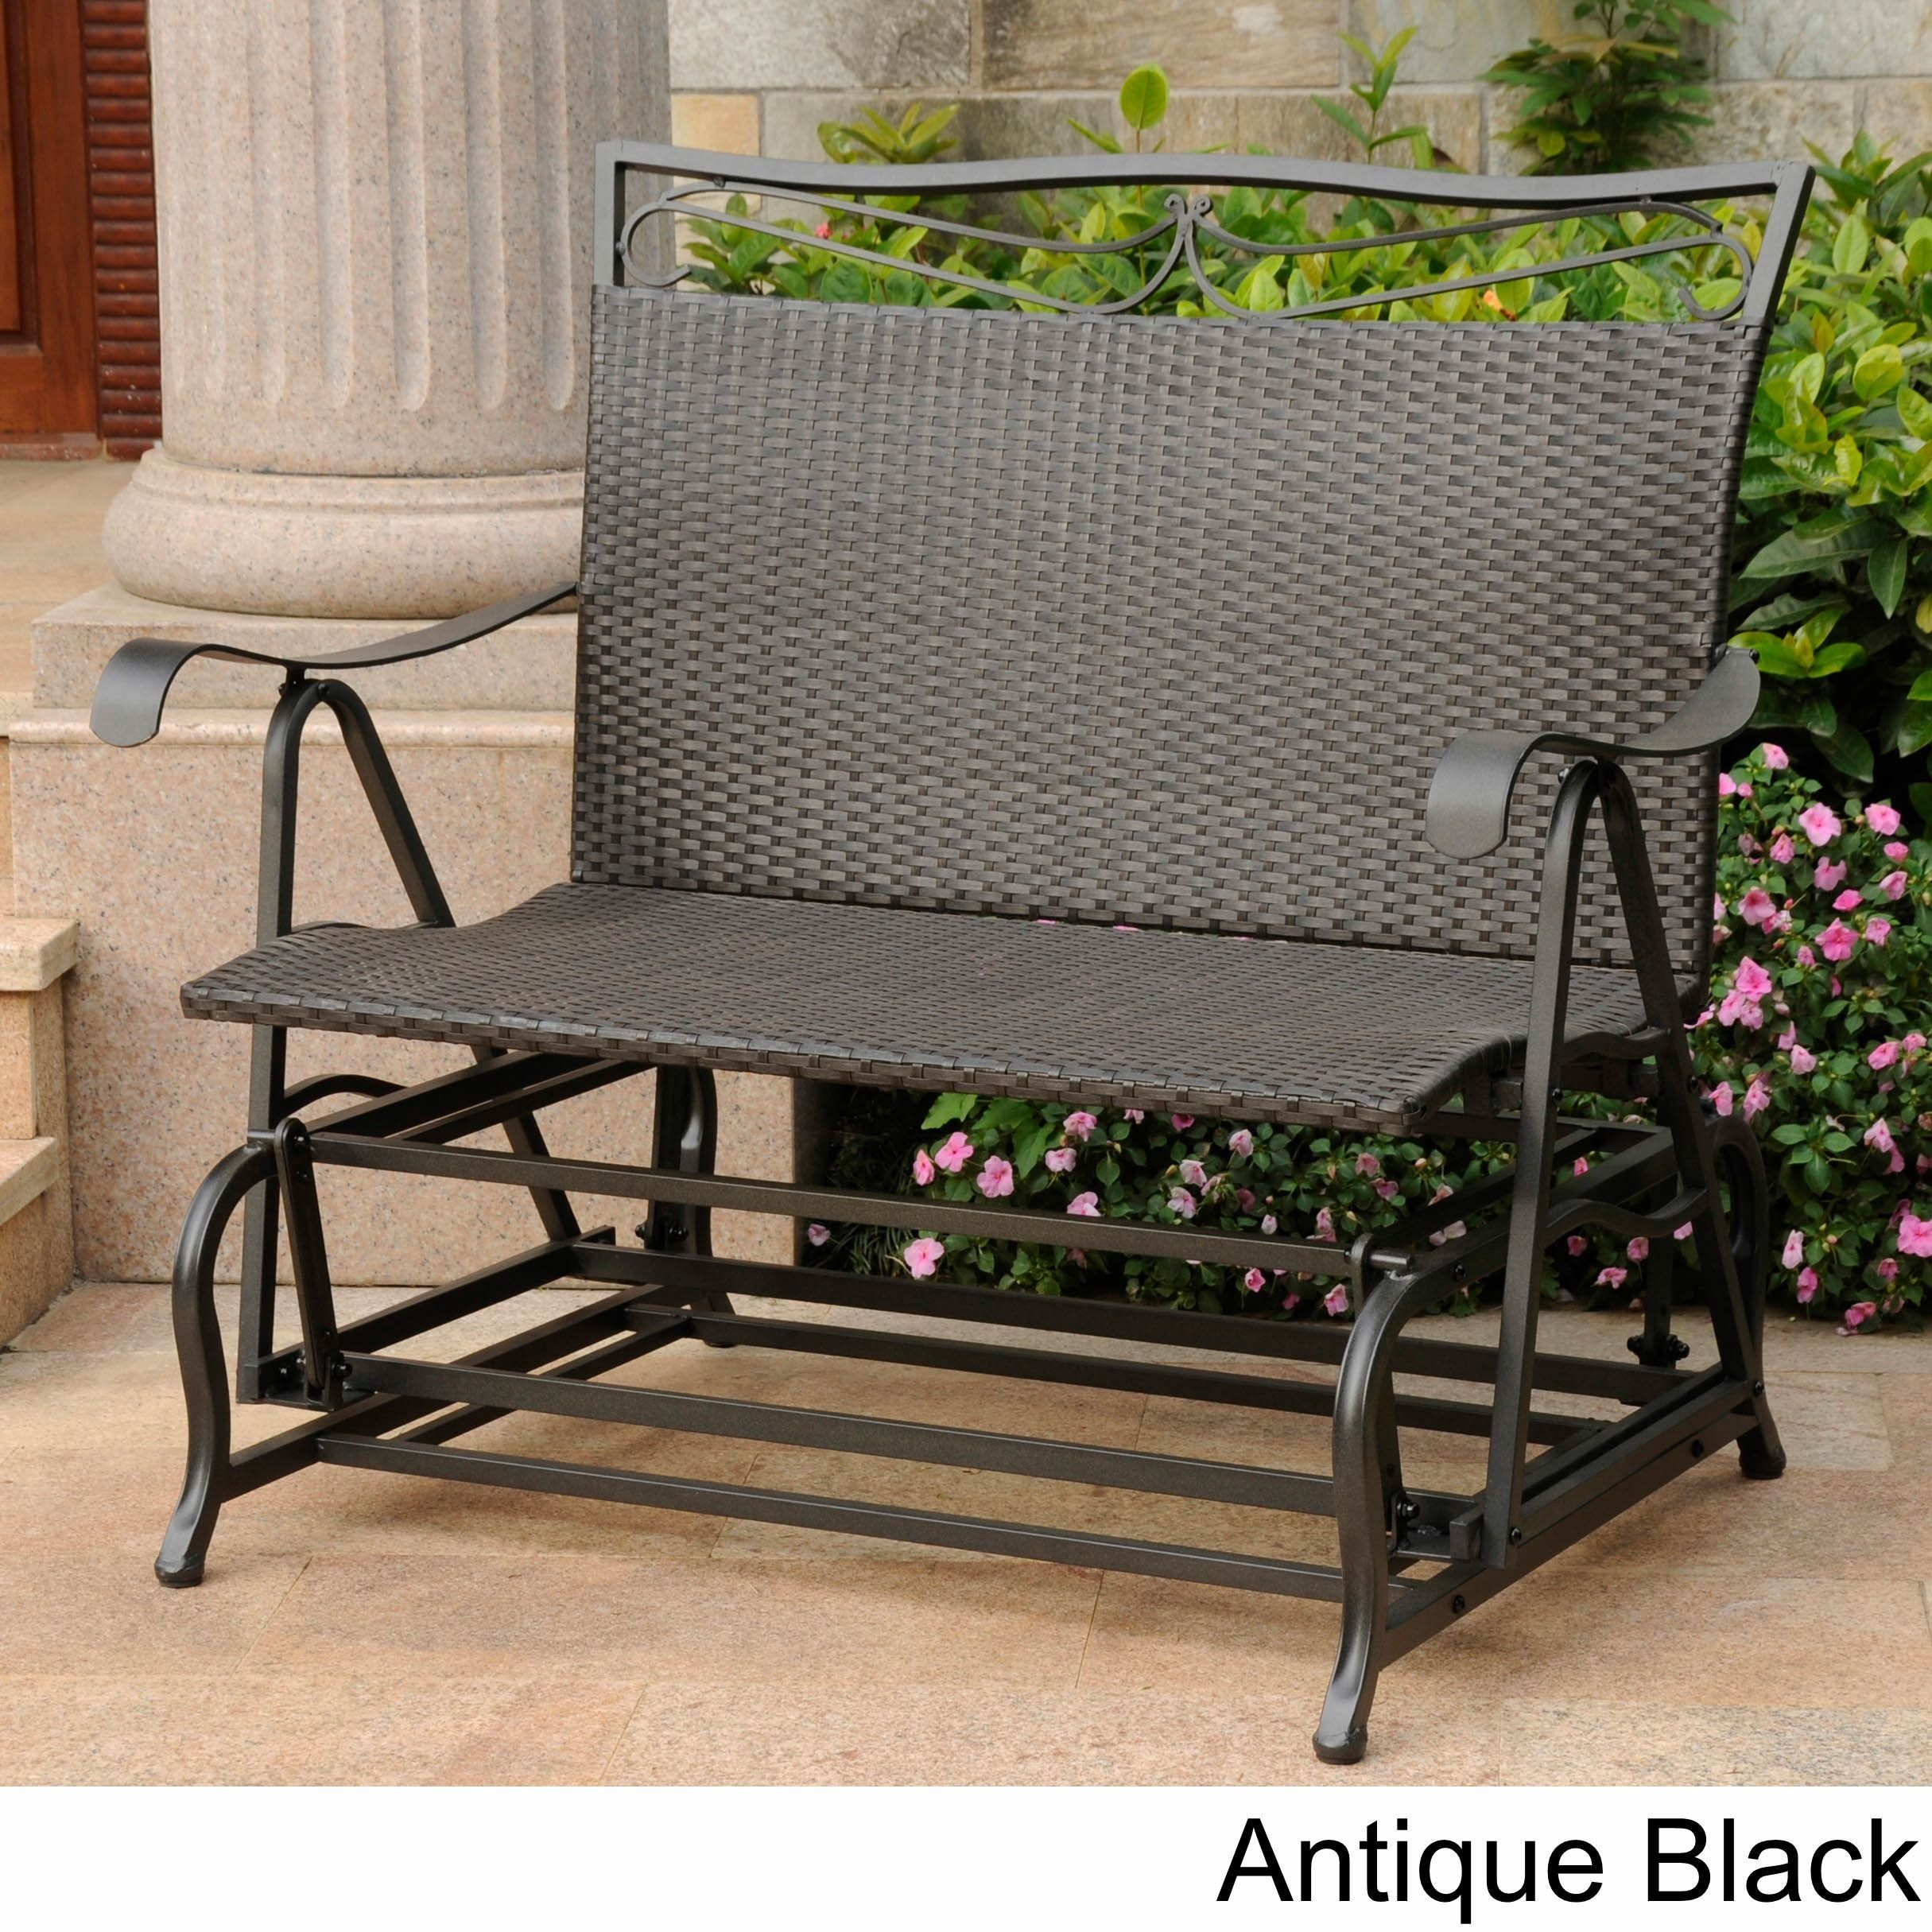 International caravan valencia resin wicker steel frame double glider chair antique black patio furniture